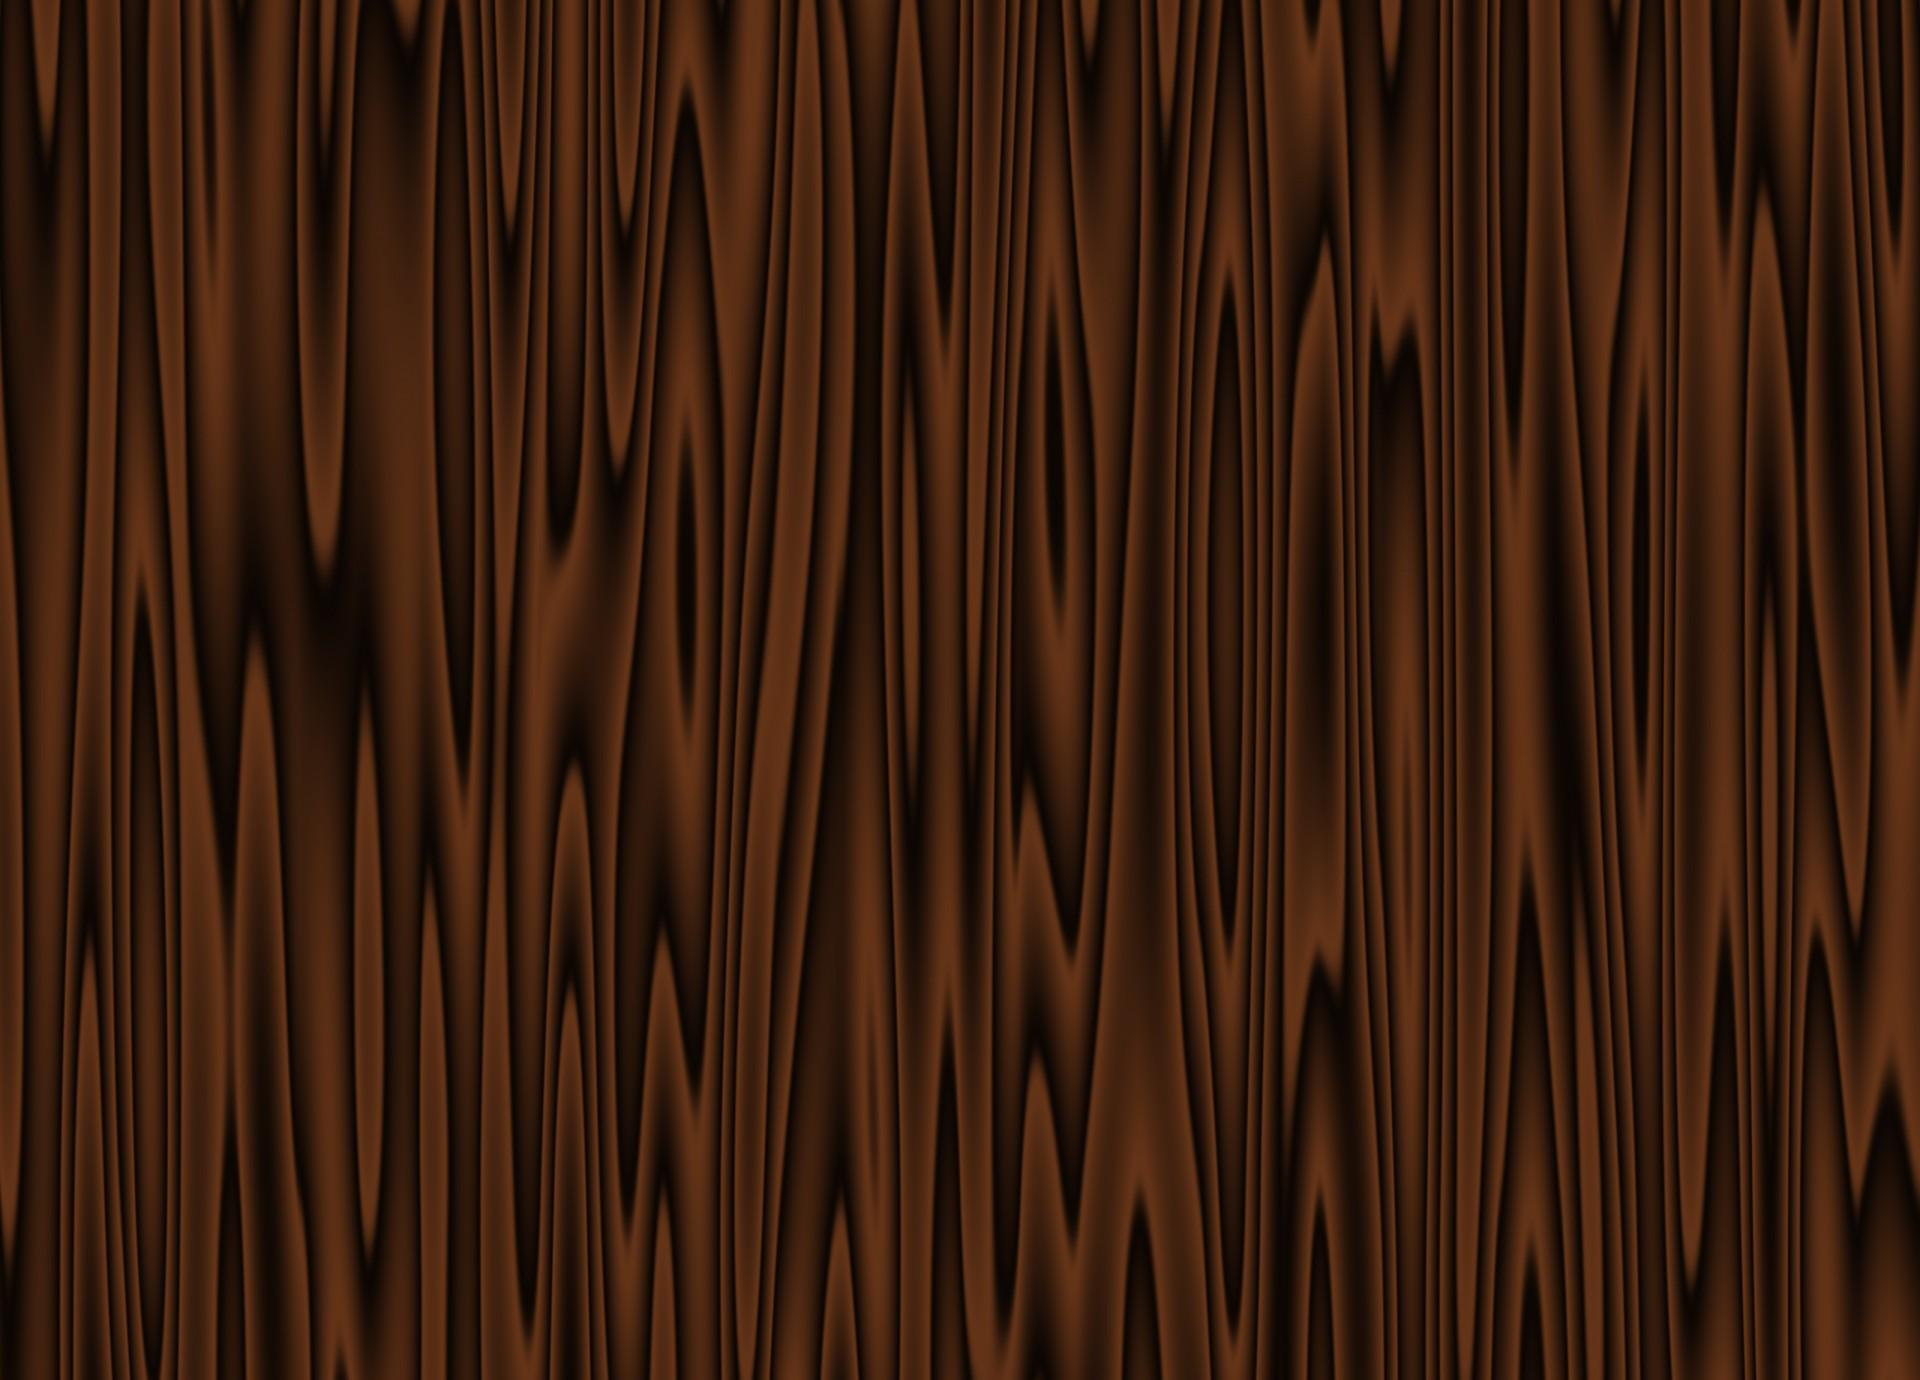 Wooden texture clipart